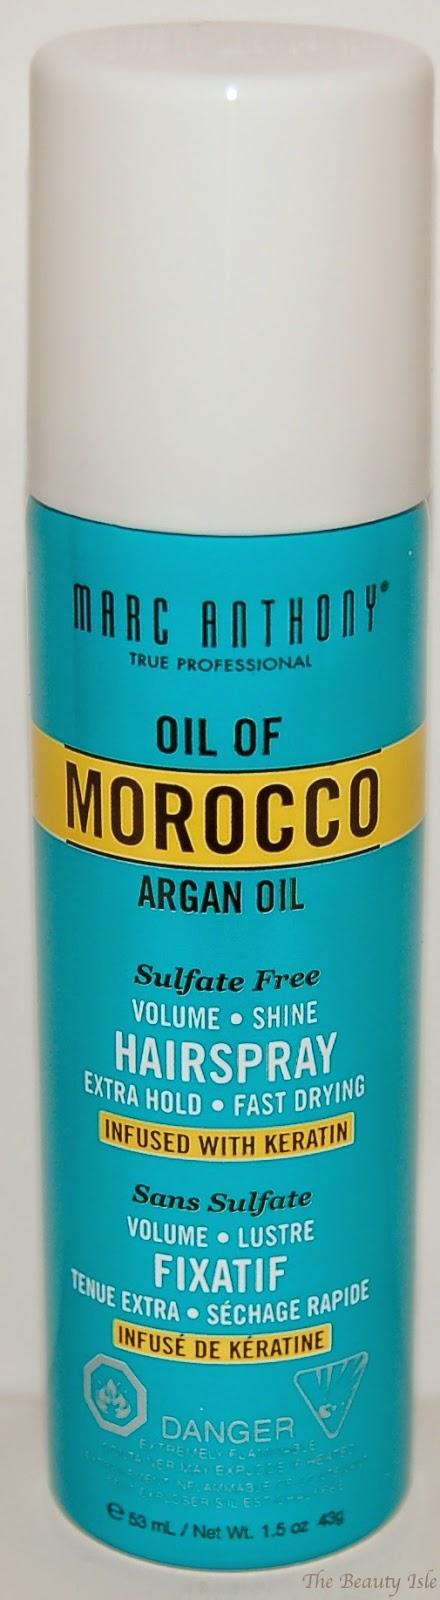 Morocco Hairspray